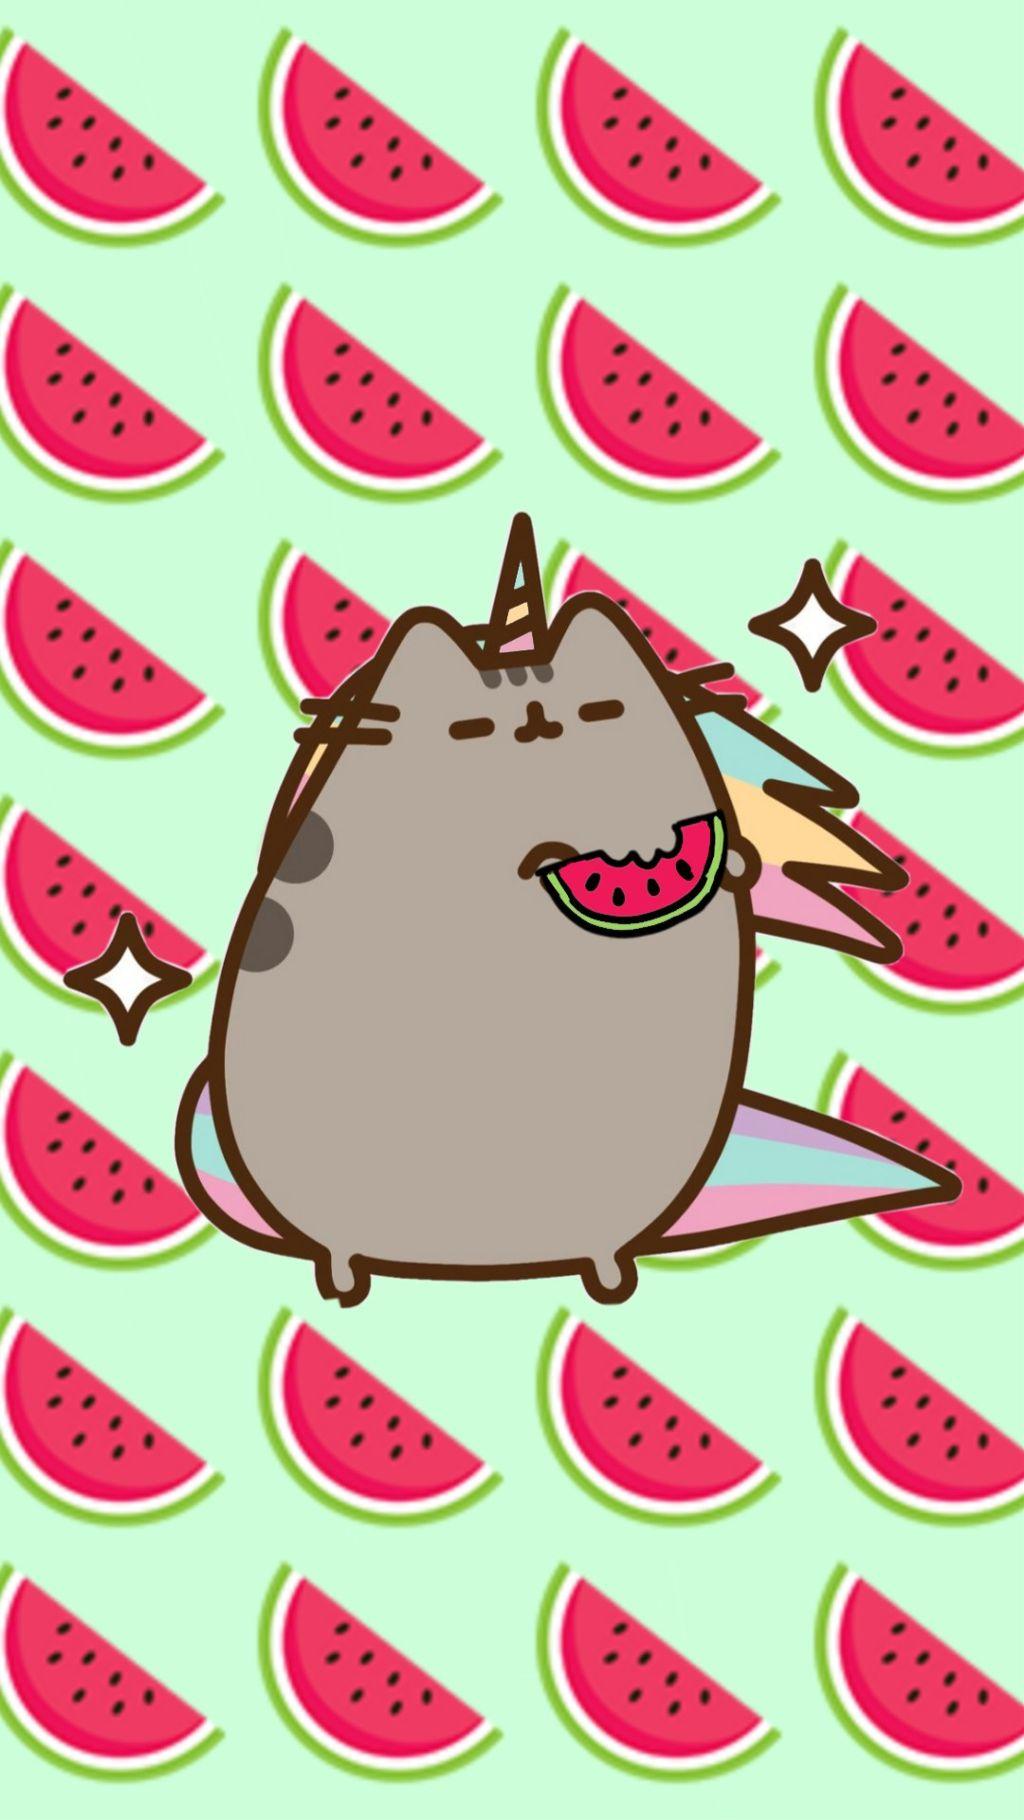 freetoedit wallpaper pusheen watermelon